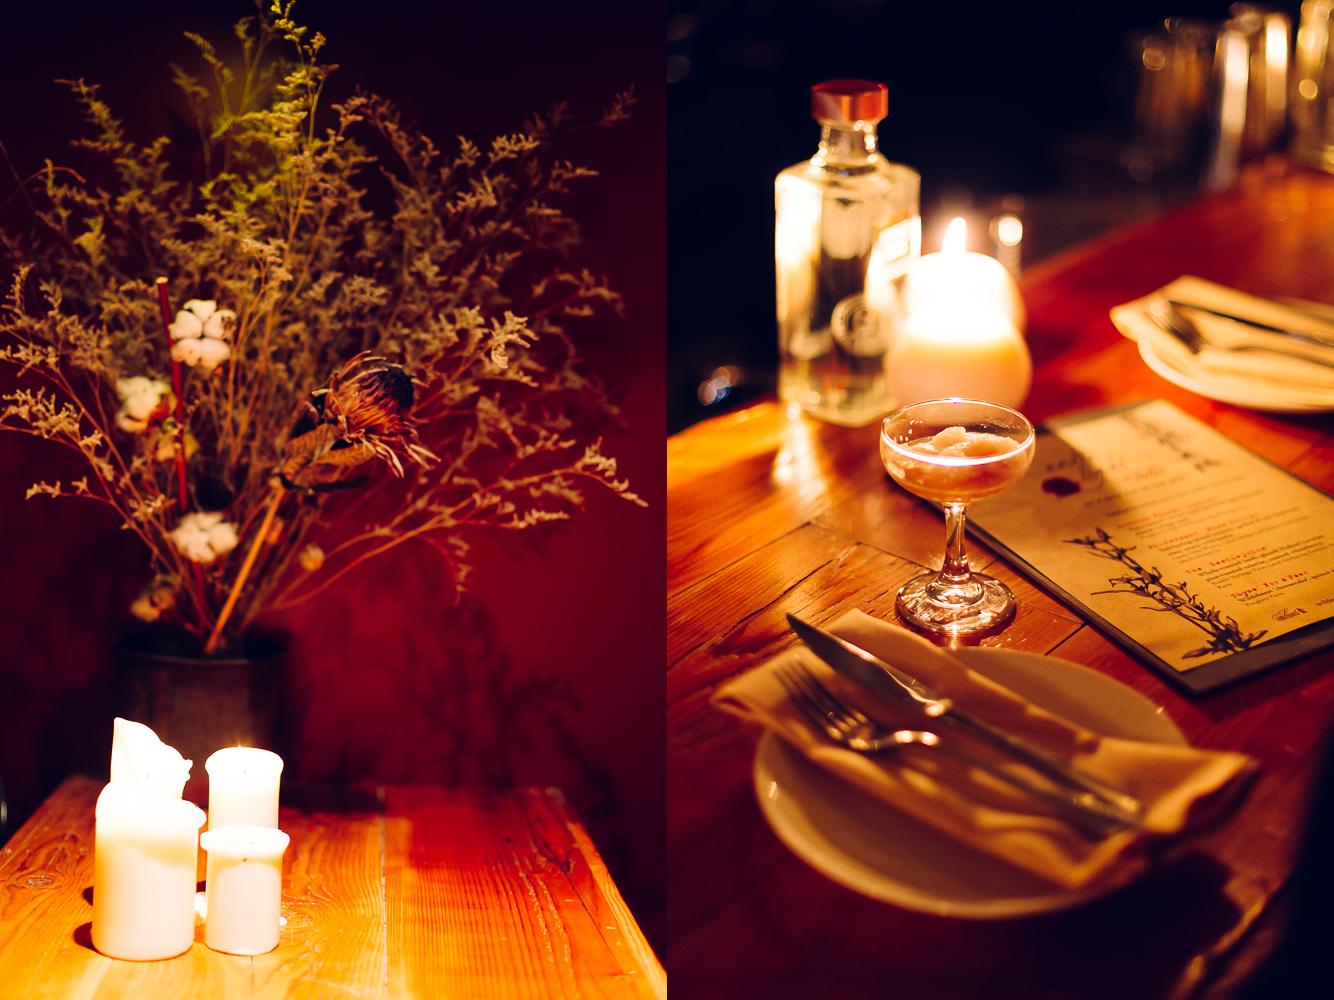 CandleLight5.jpg